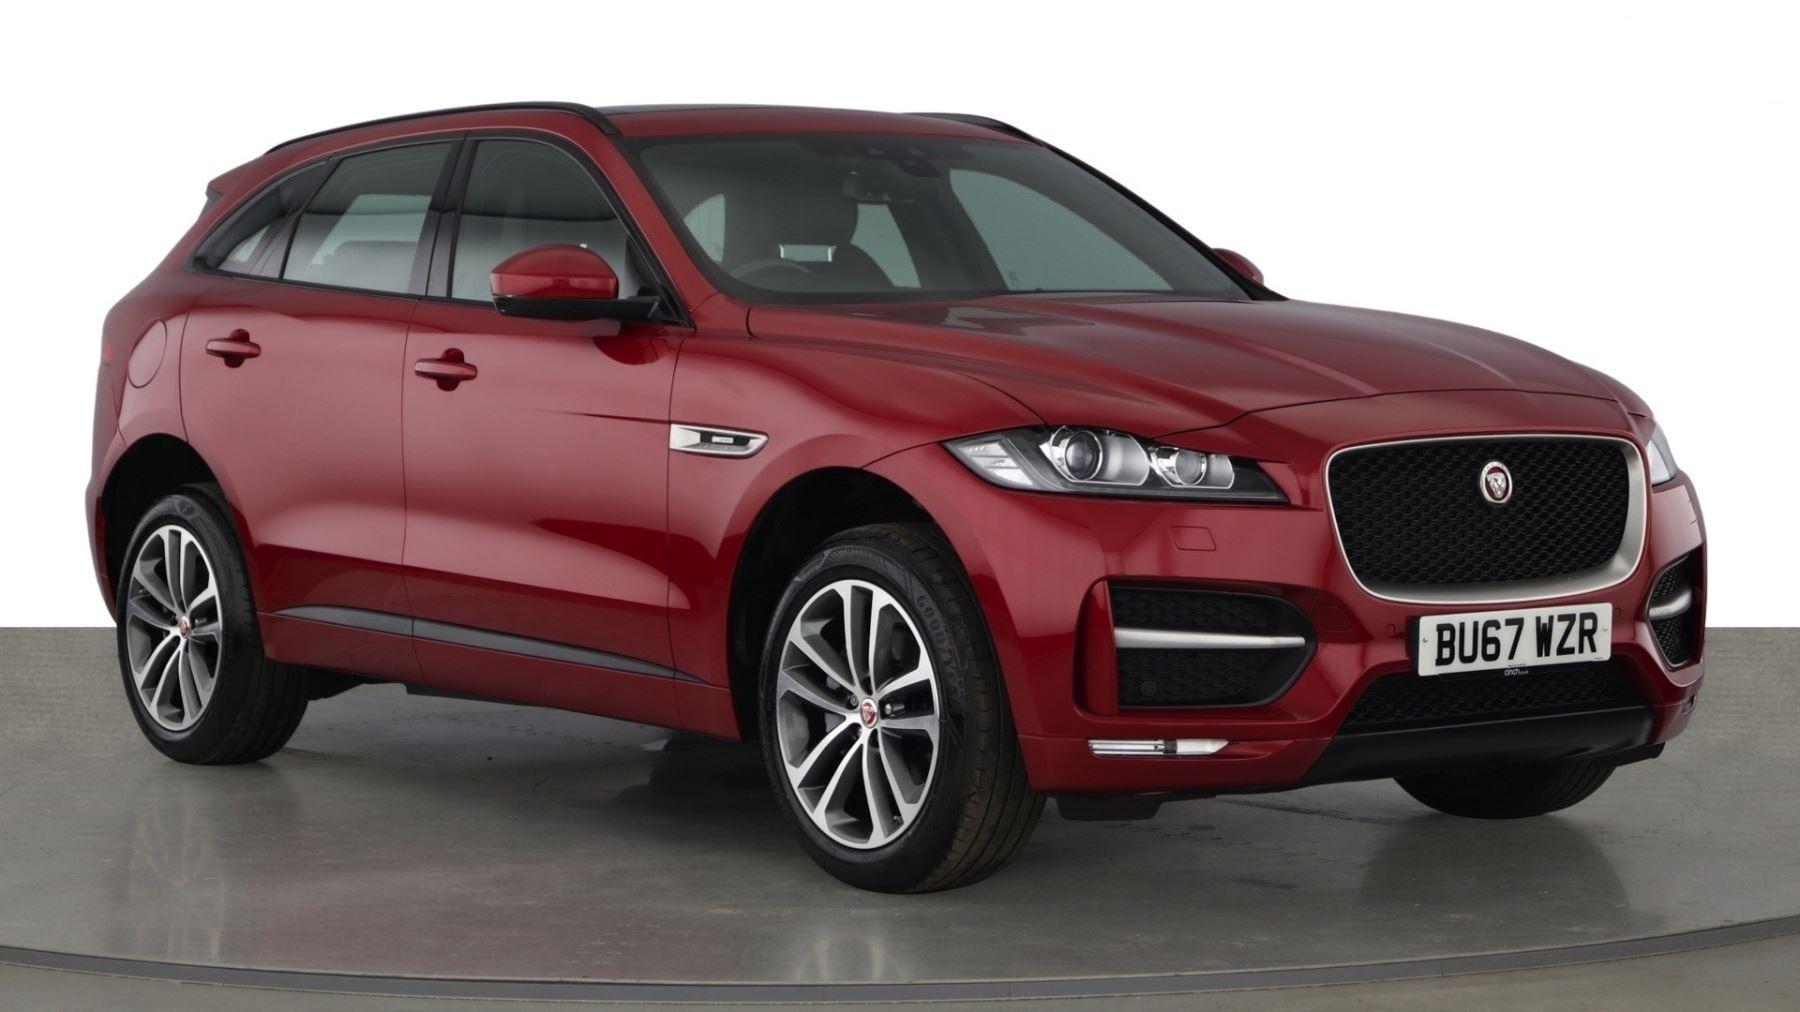 Jaguar F-PACE 2.0d R-Sport AWD - Sliding Panoramic Roof - Rear View Camera Diesel Automatic 5 door Estate